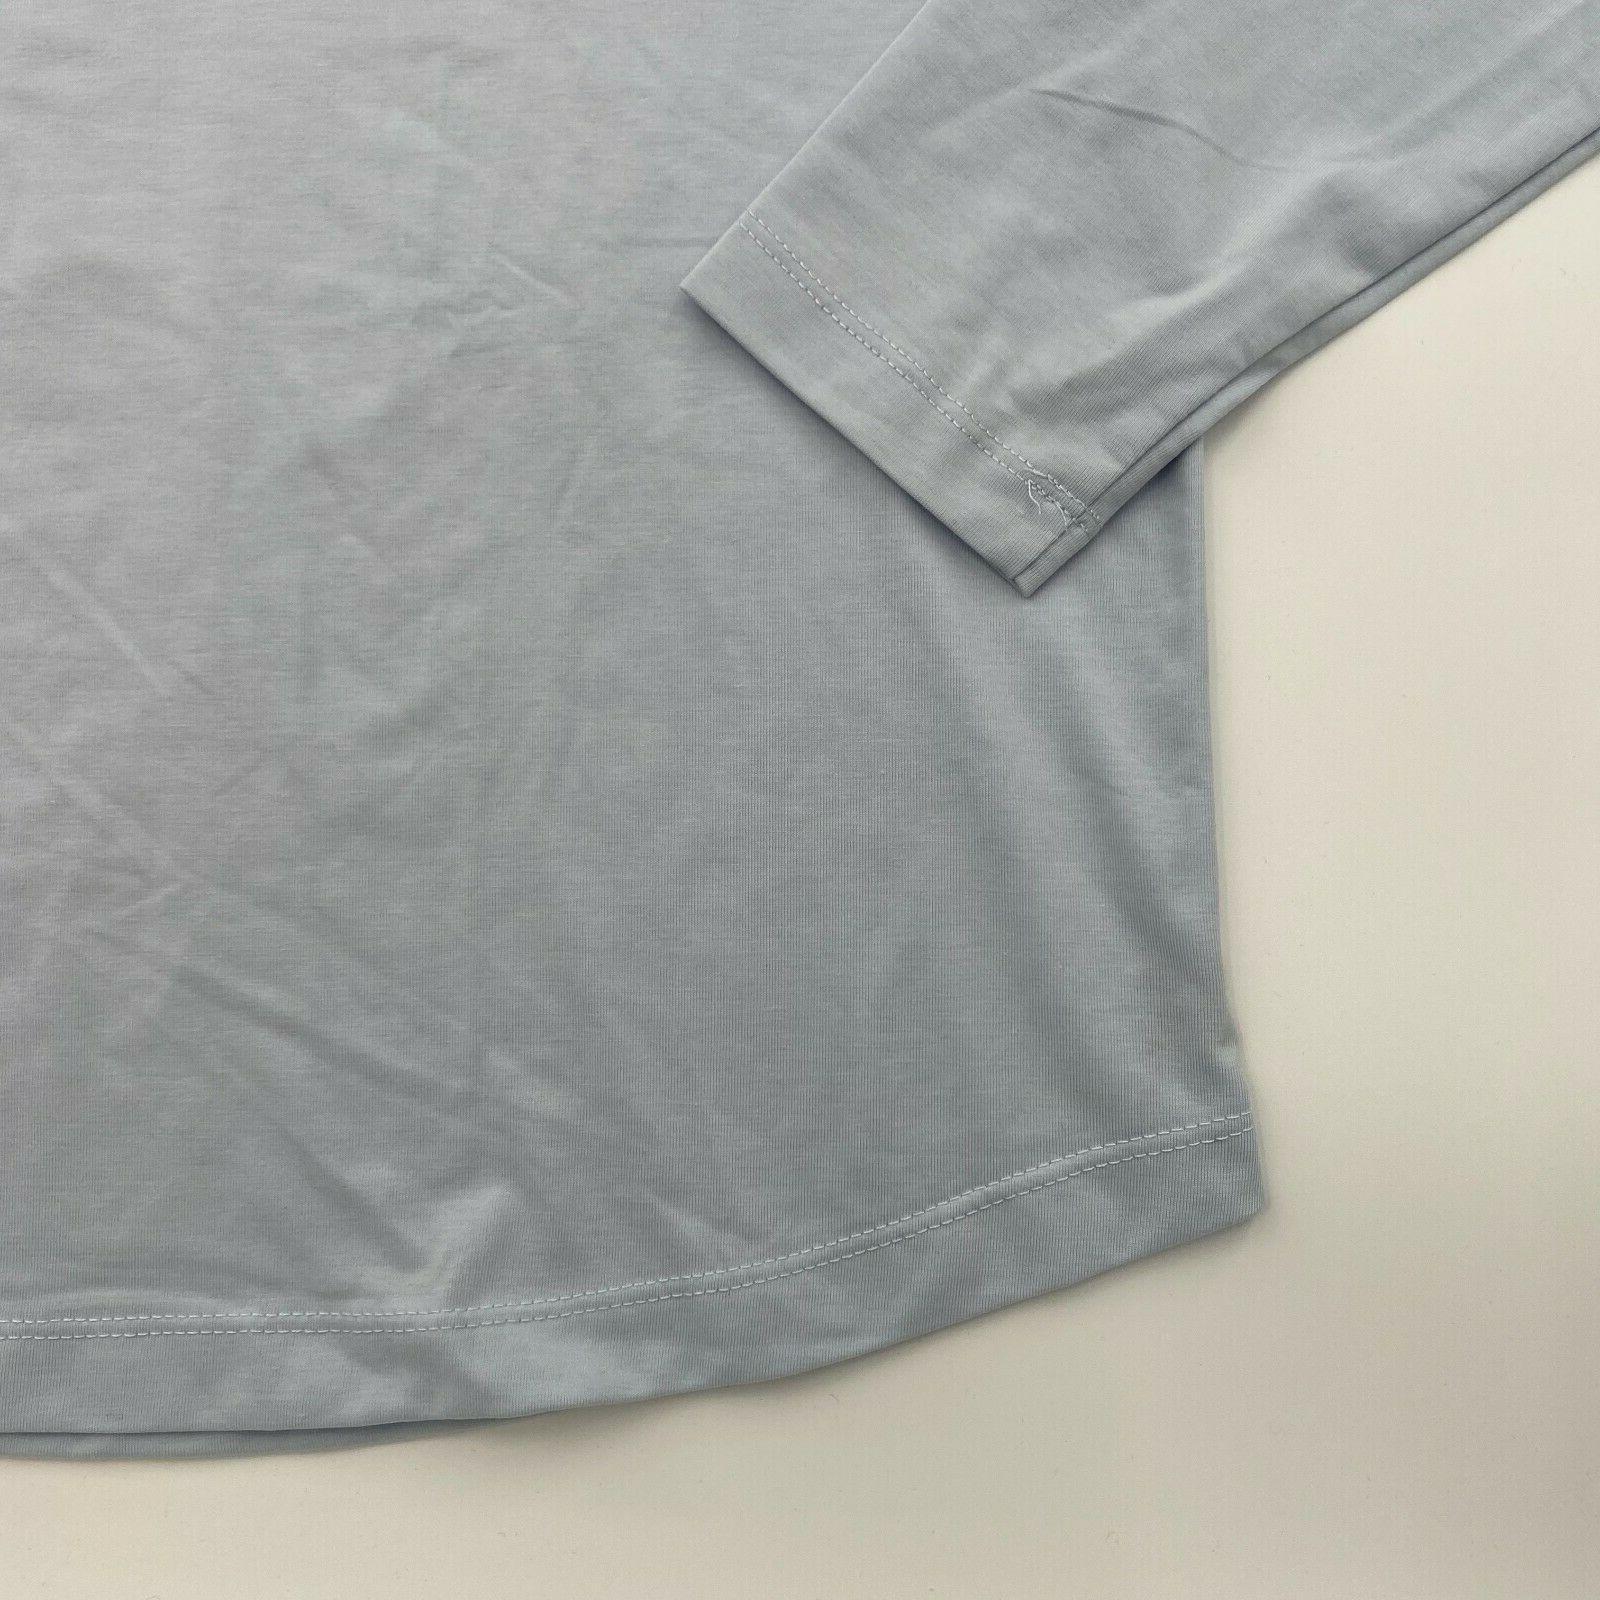 Cuts Clothing Hem Hooded Tee Size